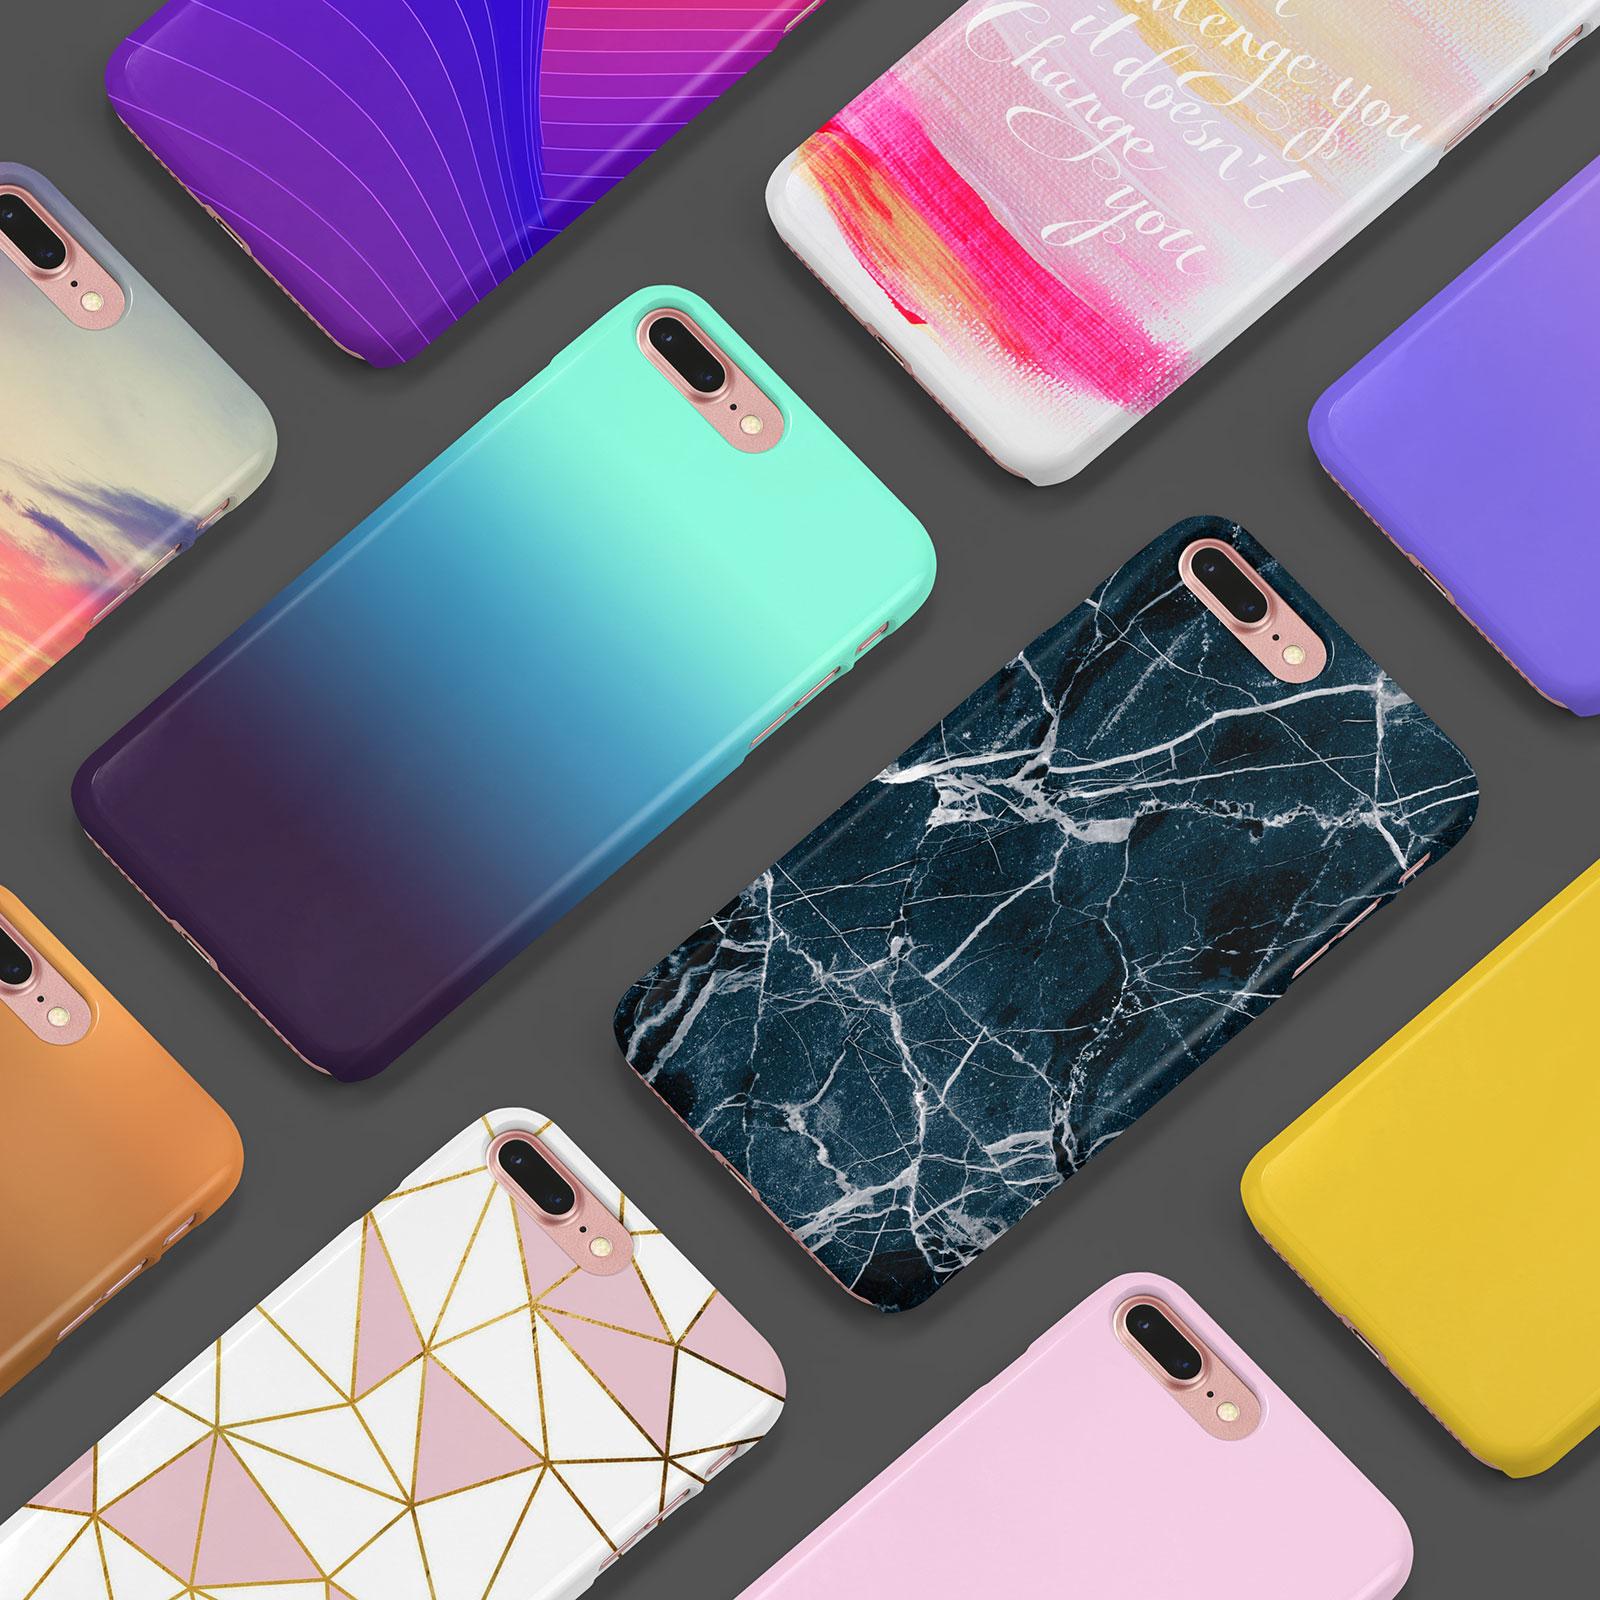 Free-iPhone-8-Plus-Plastic-Case-Mockup-PSD-Set-3